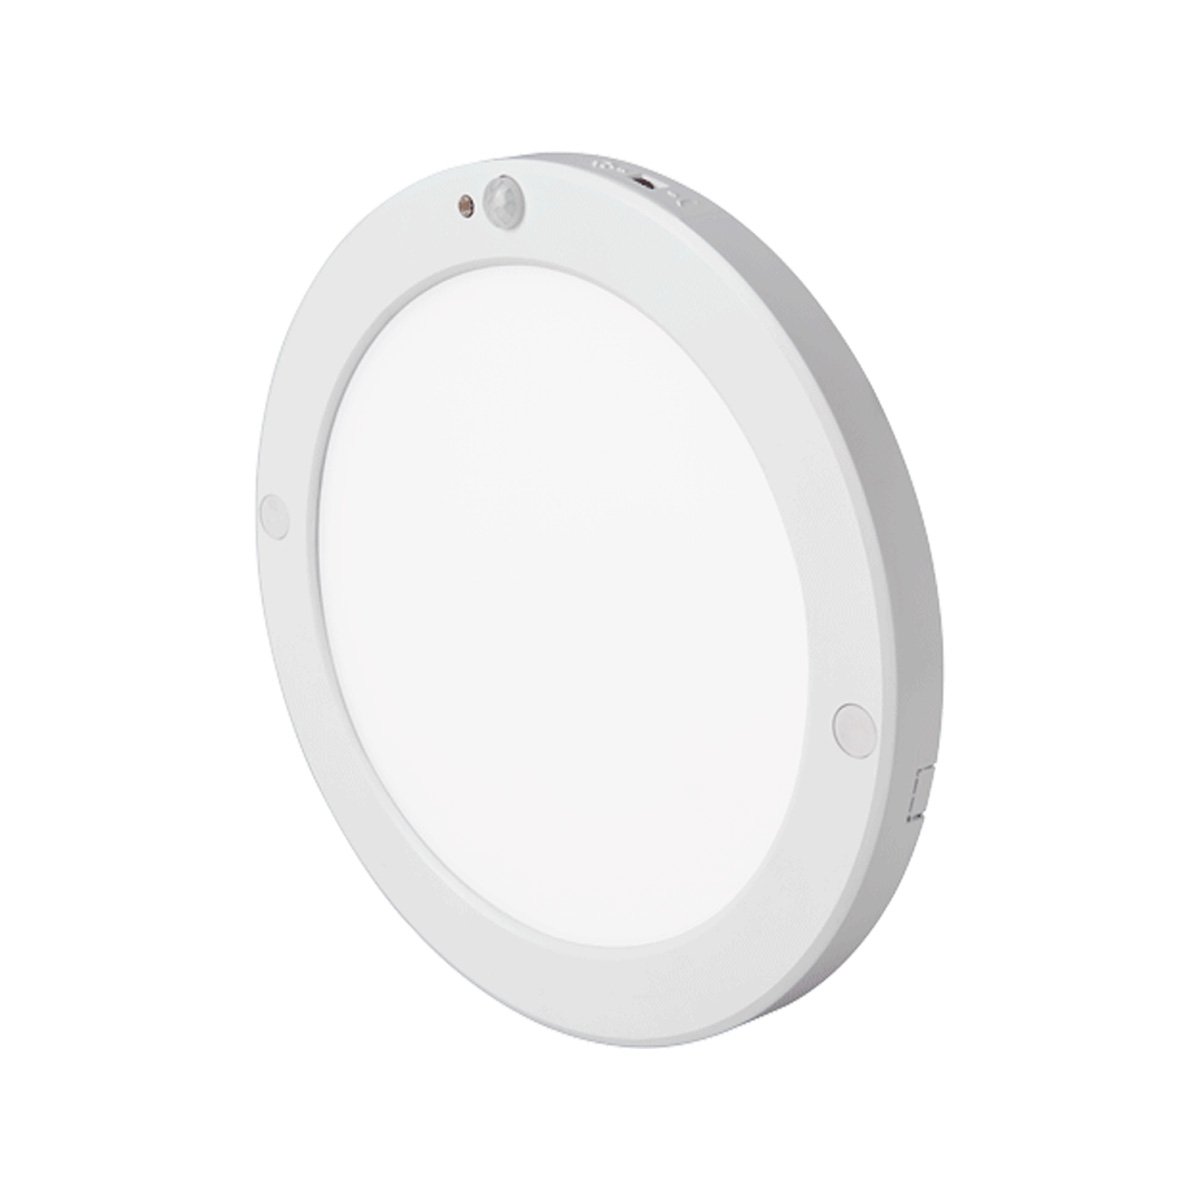 Mobilux MOBiLED Sensor LED Wand- / Deckenleuchte 02500205